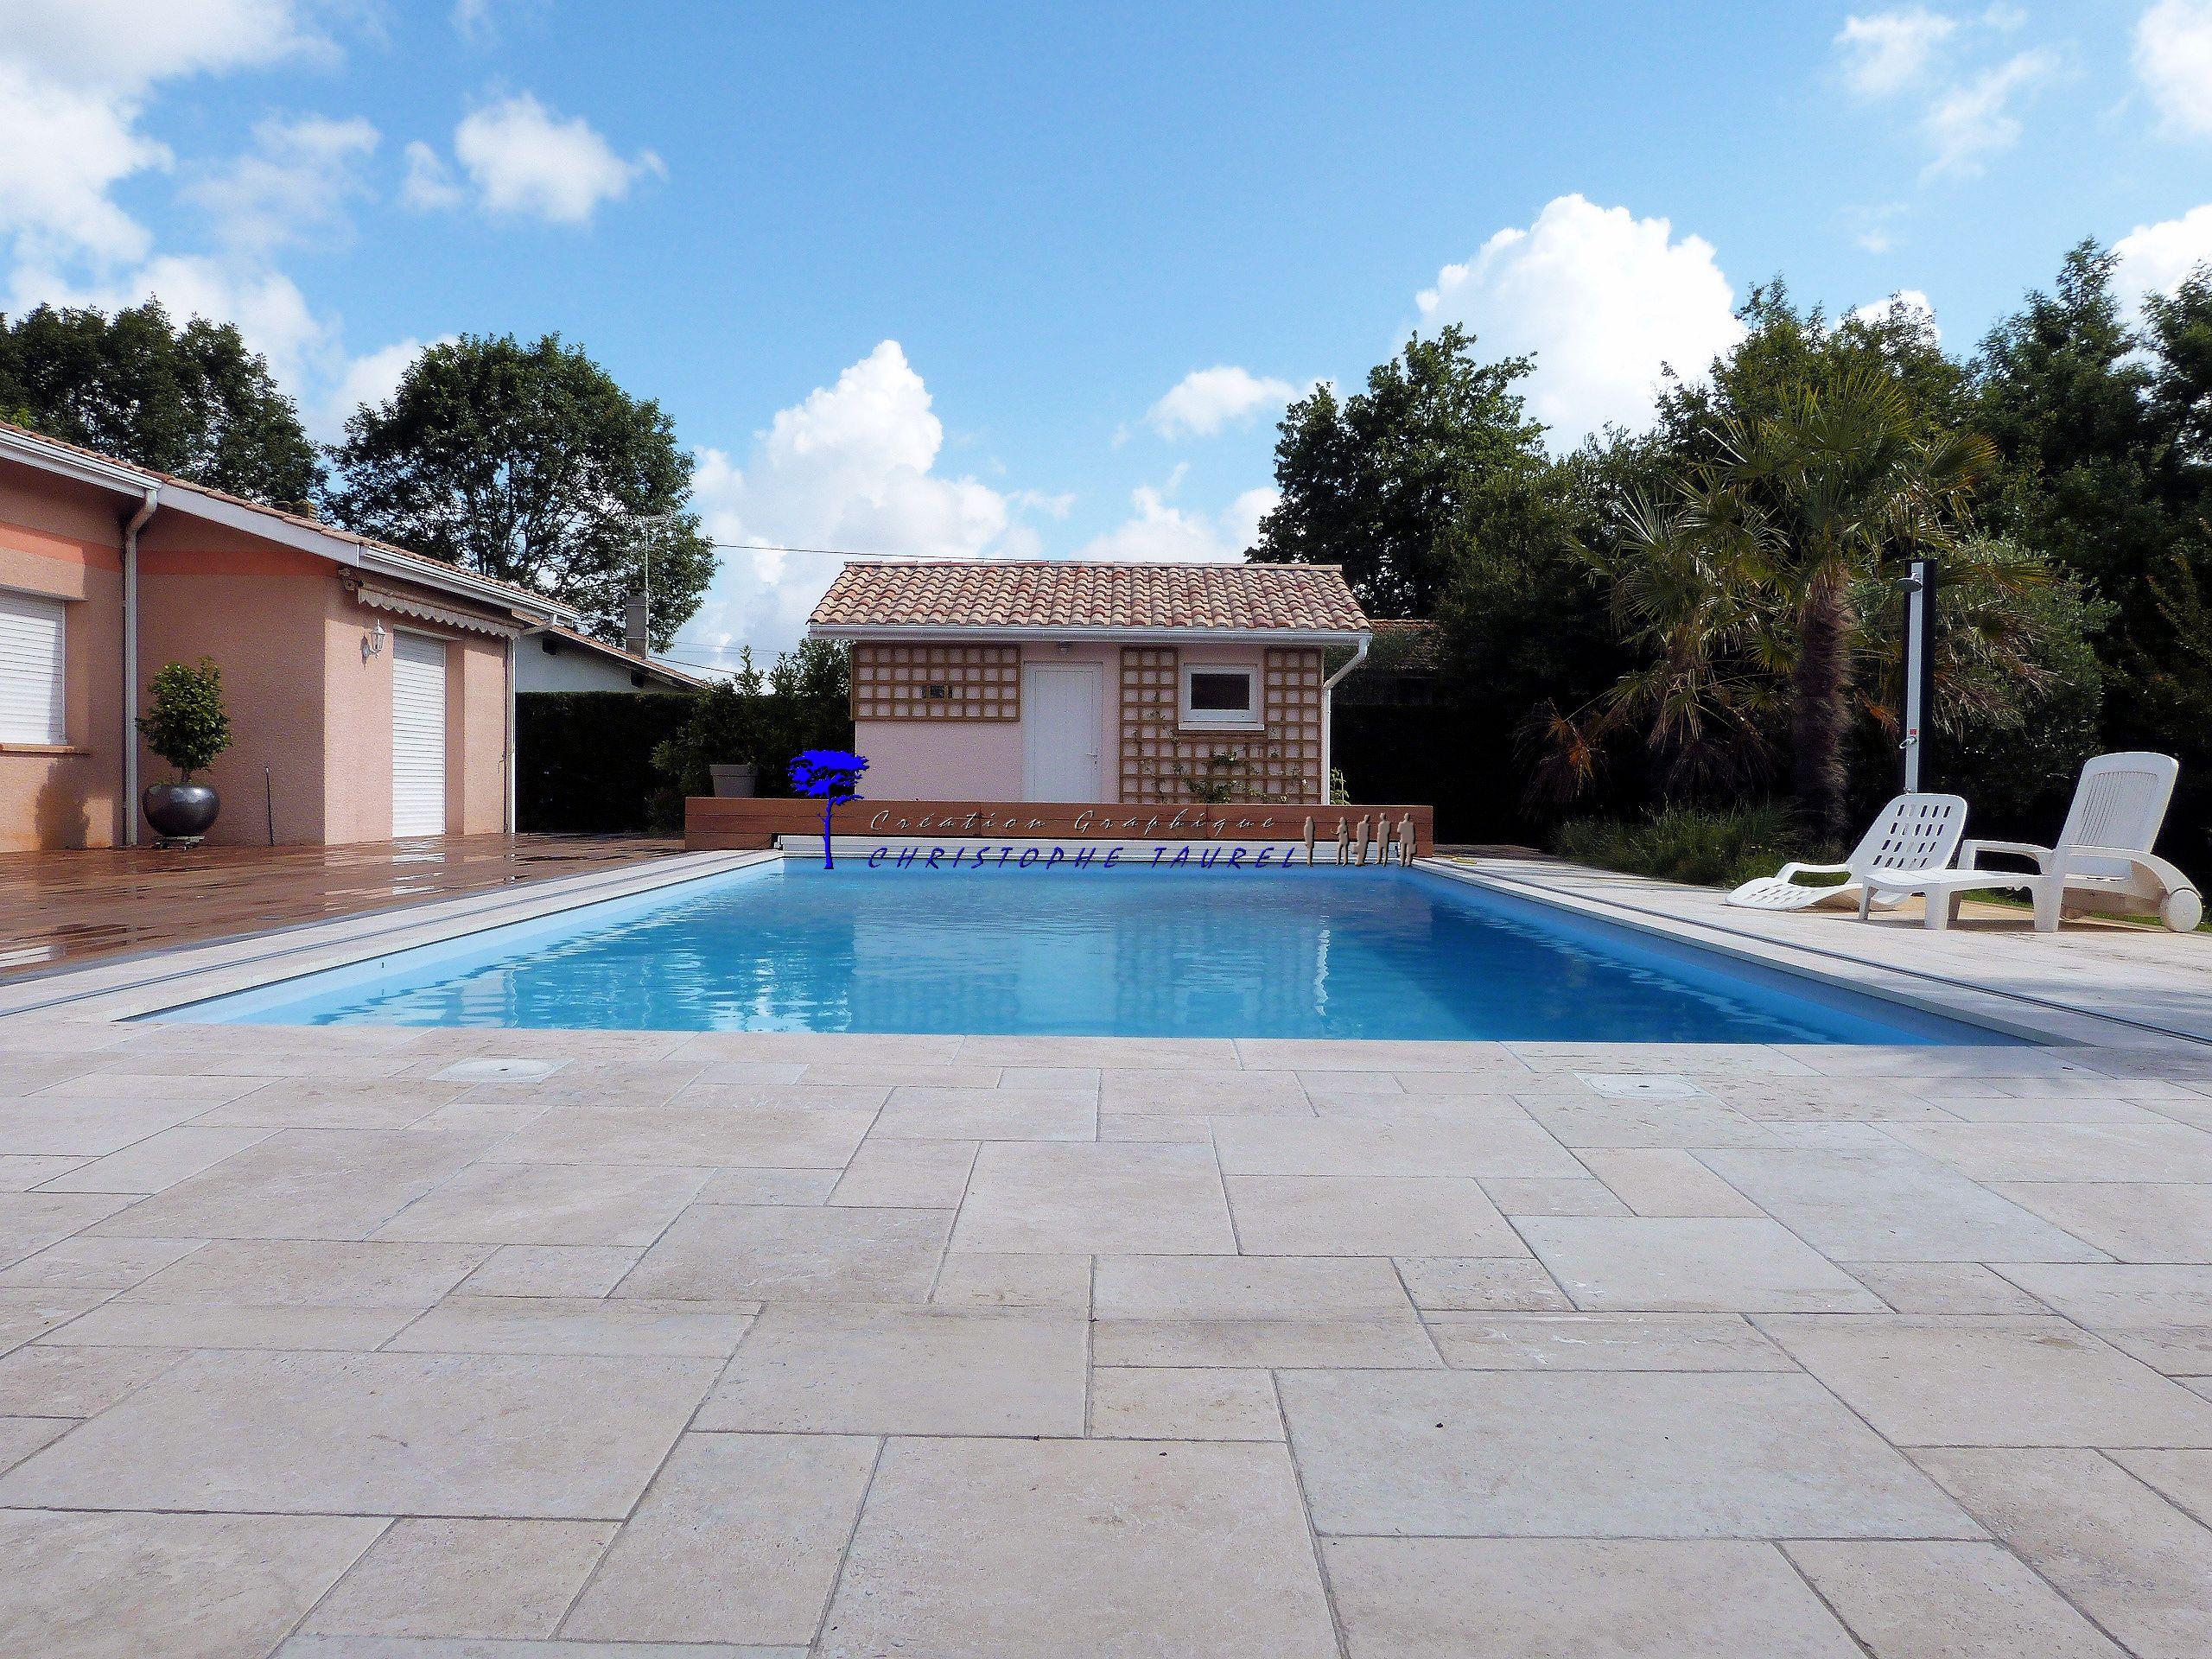 carrelage terrasse piscine local technique et treillage en bois